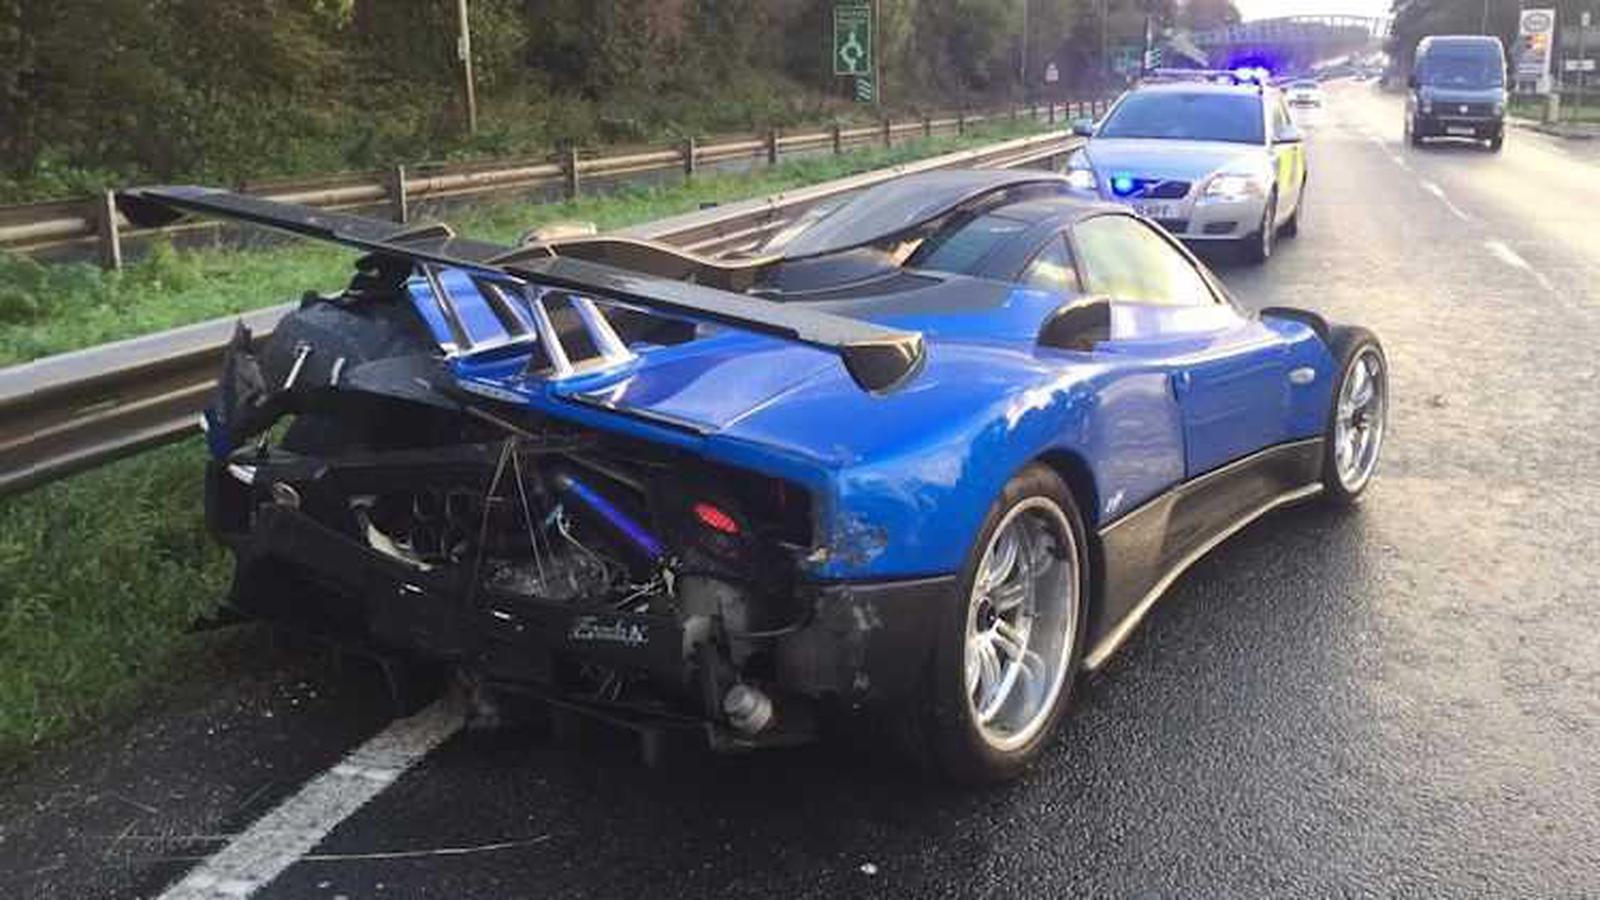 The 1 7 Million Motorway Crash Involving An Italian Supercar